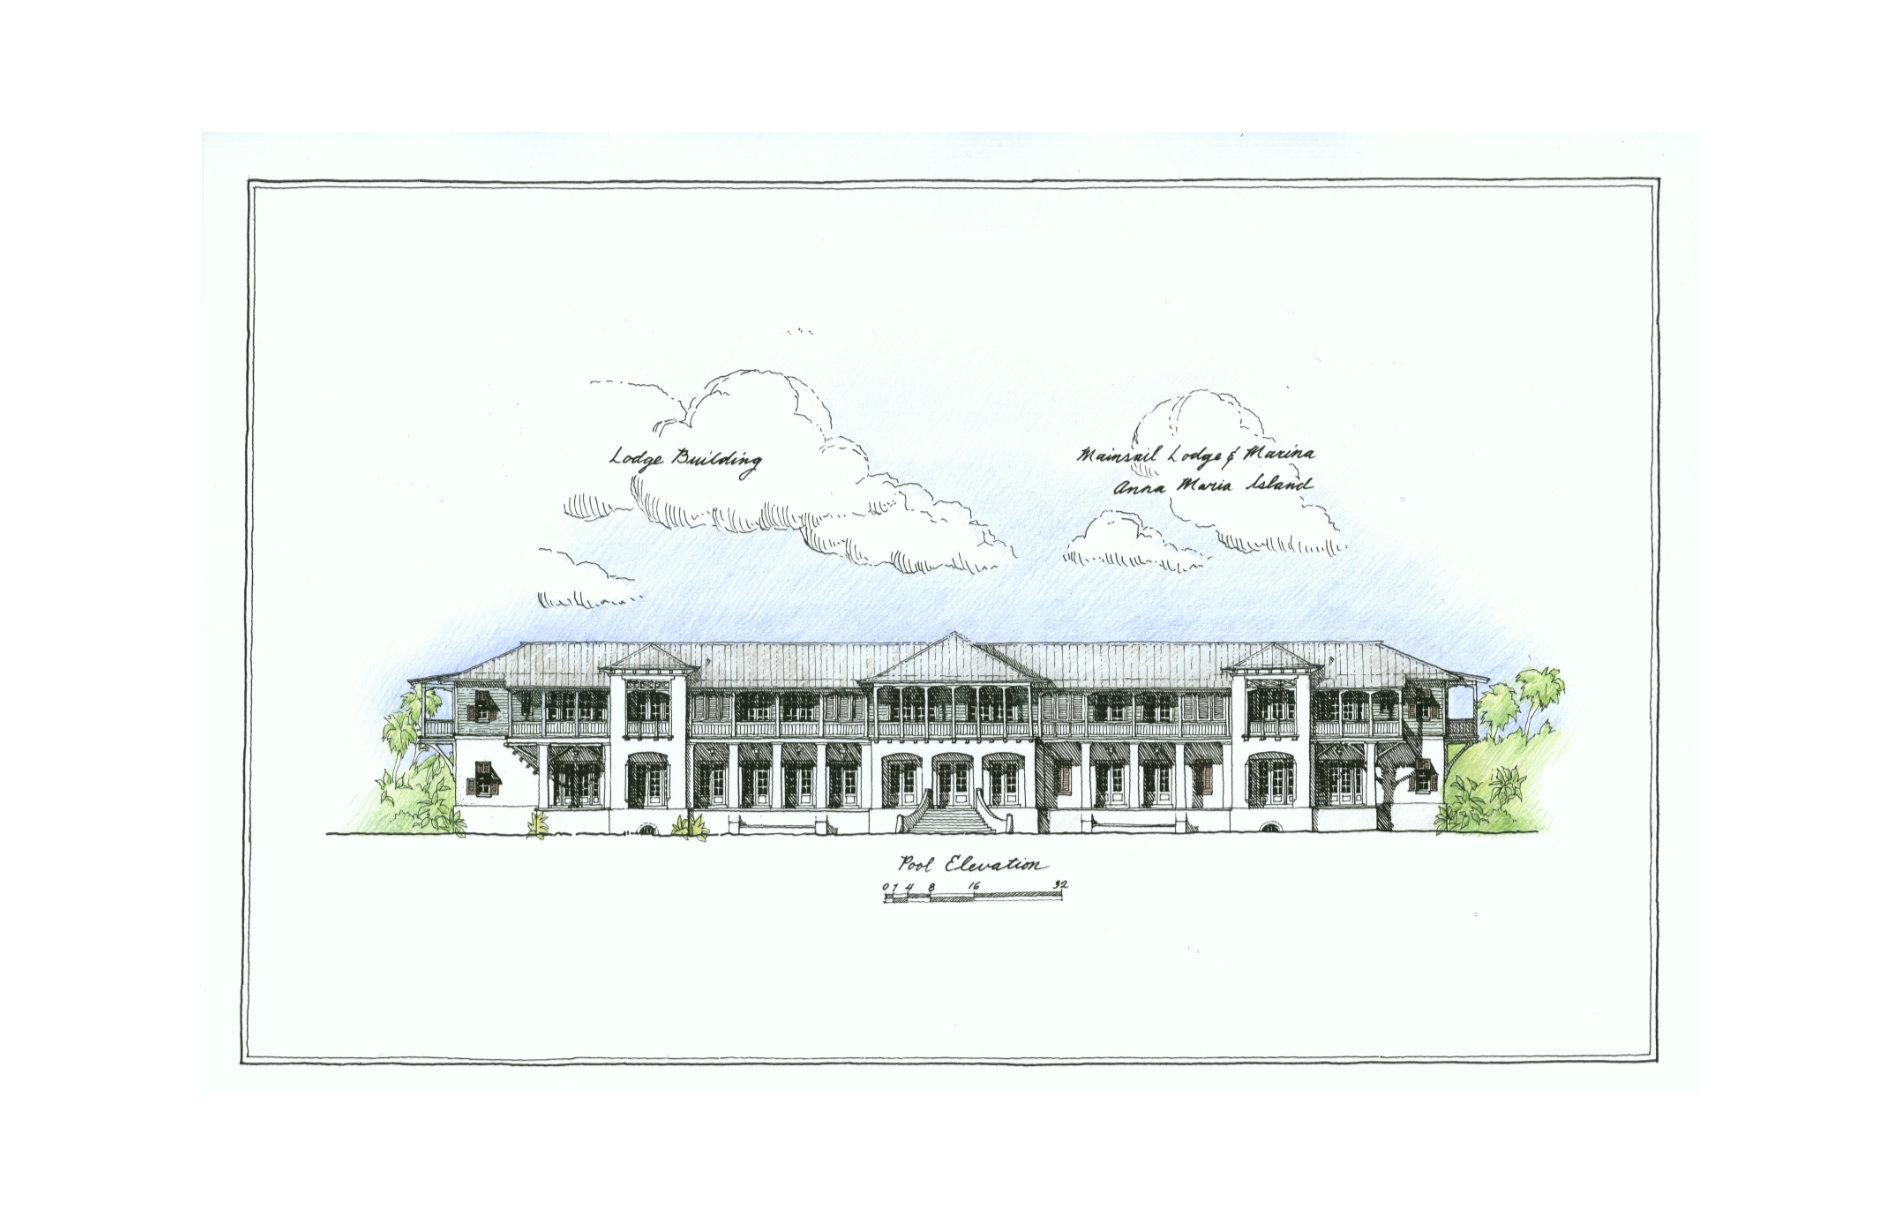 MainSail-Lodge-elev1-color4.jpg